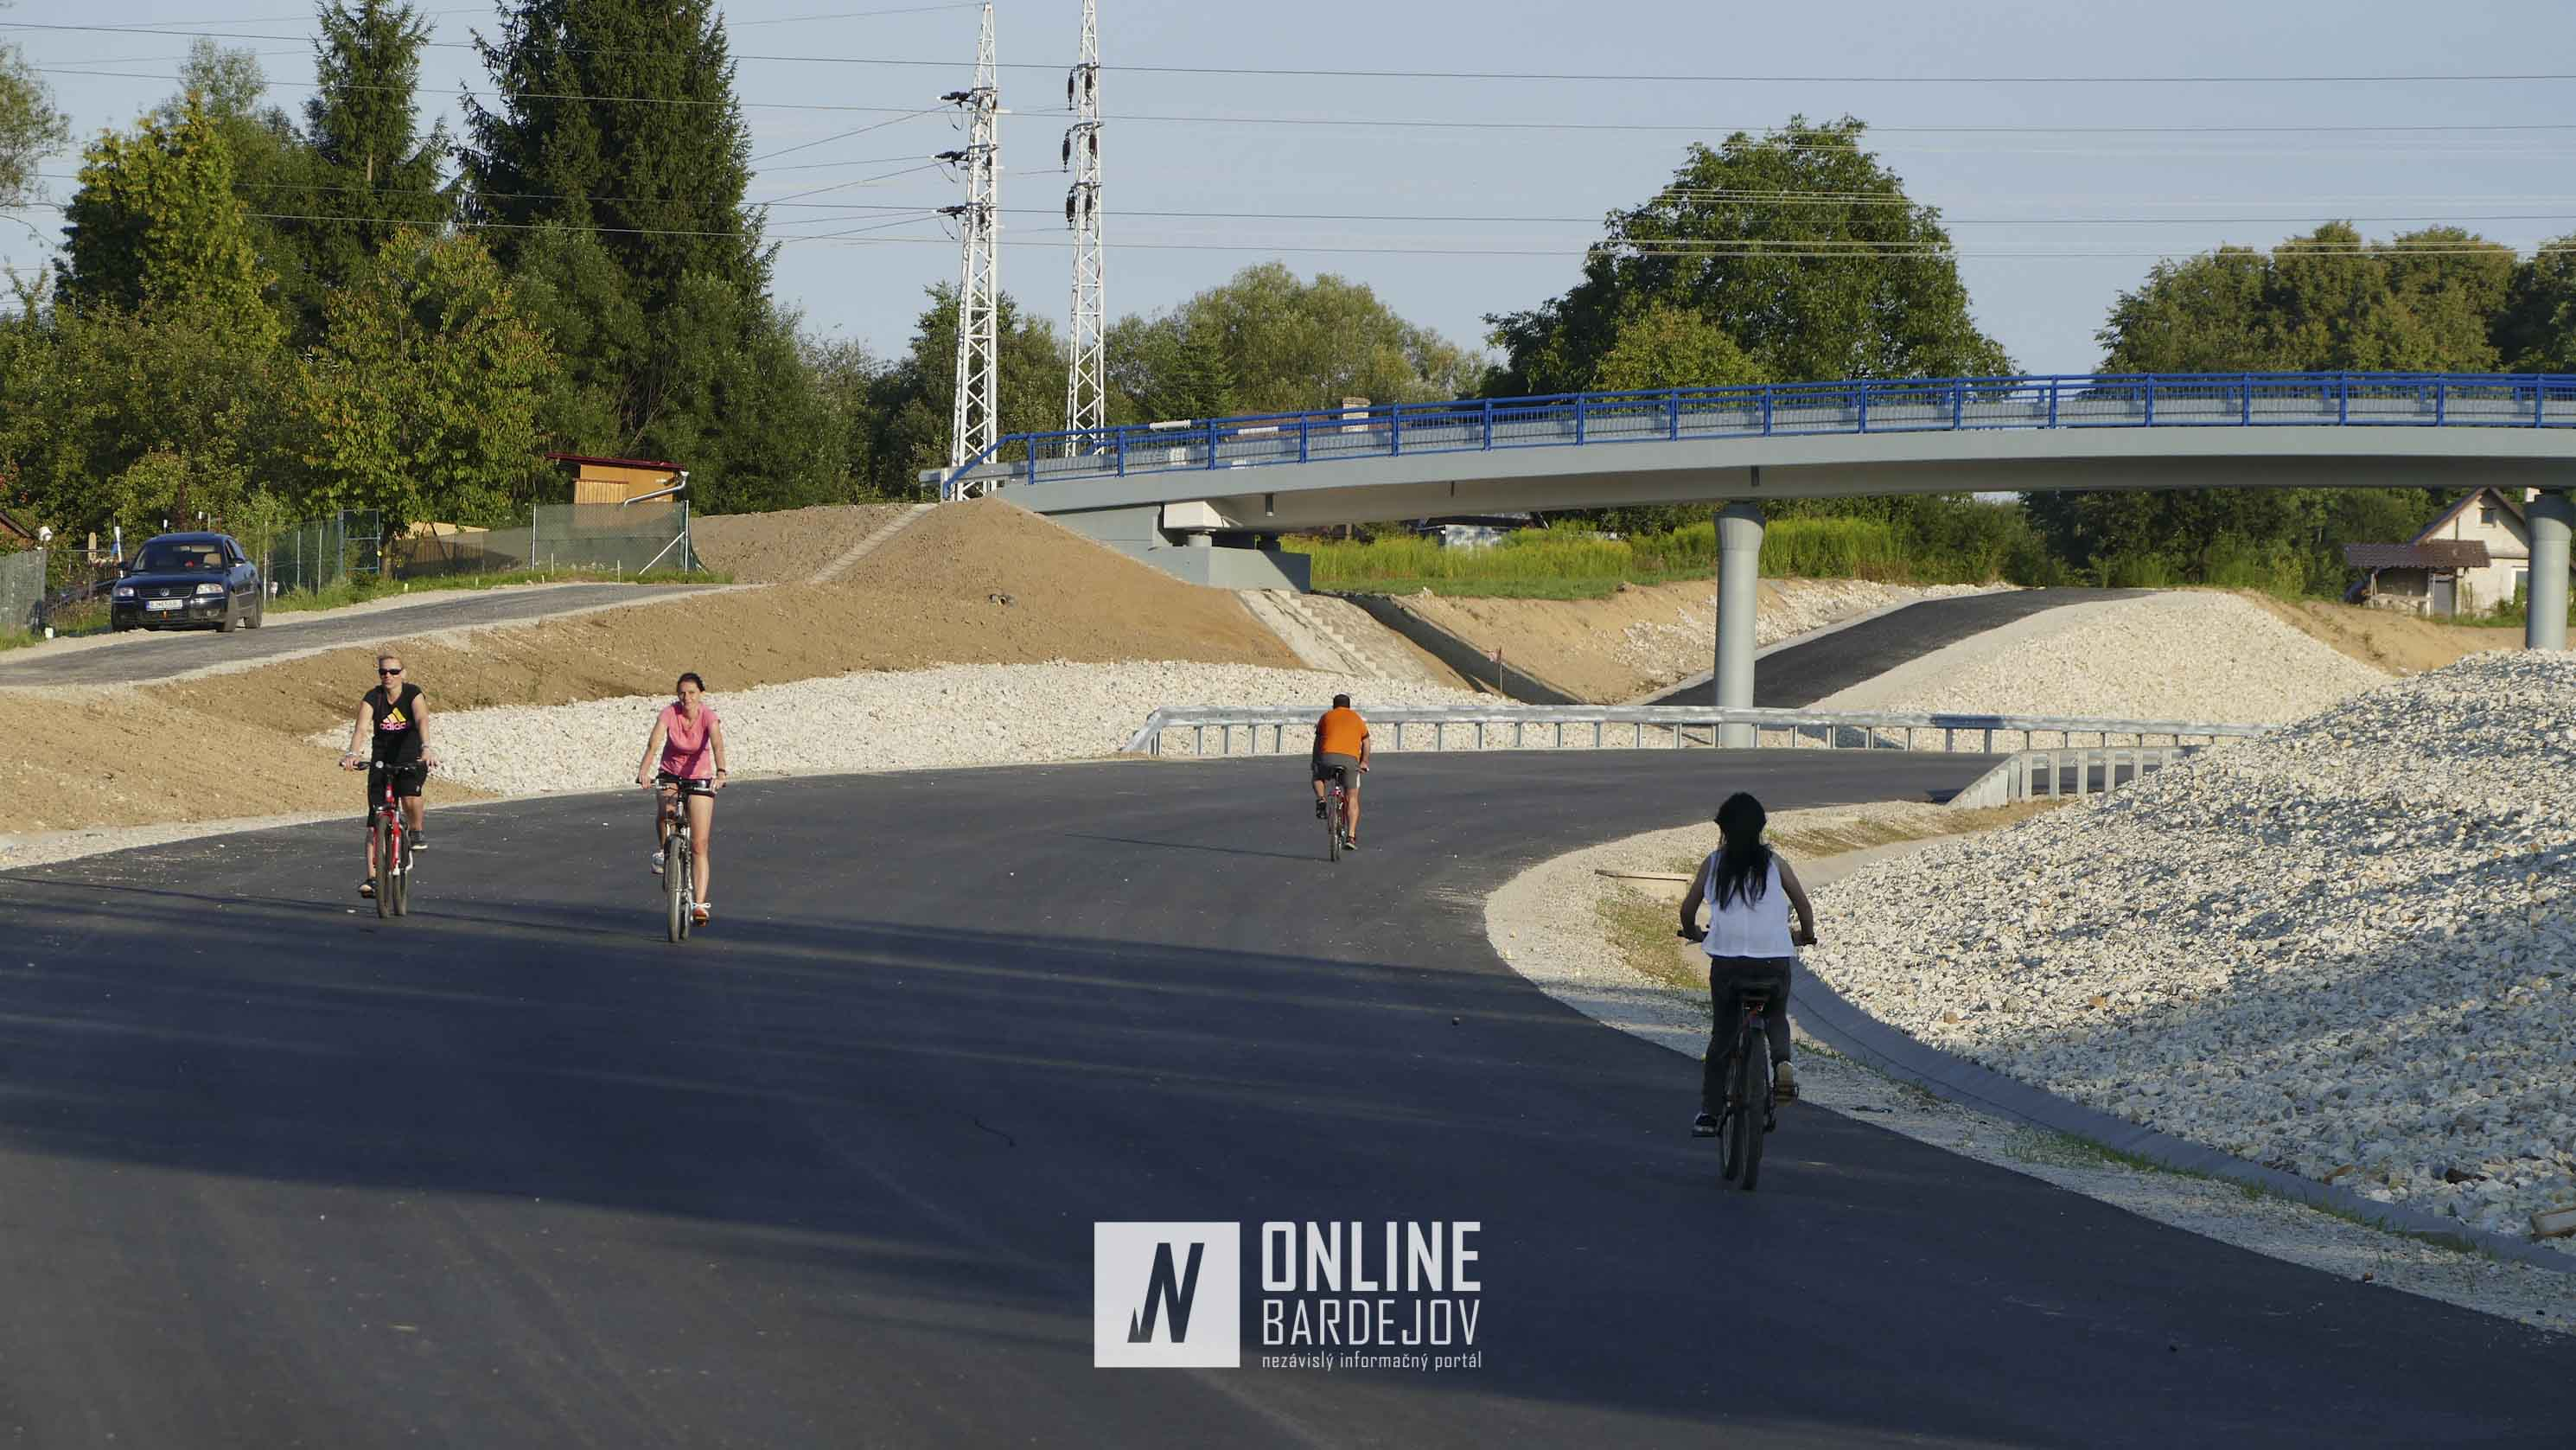 Juhozápadný obchvat sa stal dočasným cyklistickým chodníkom